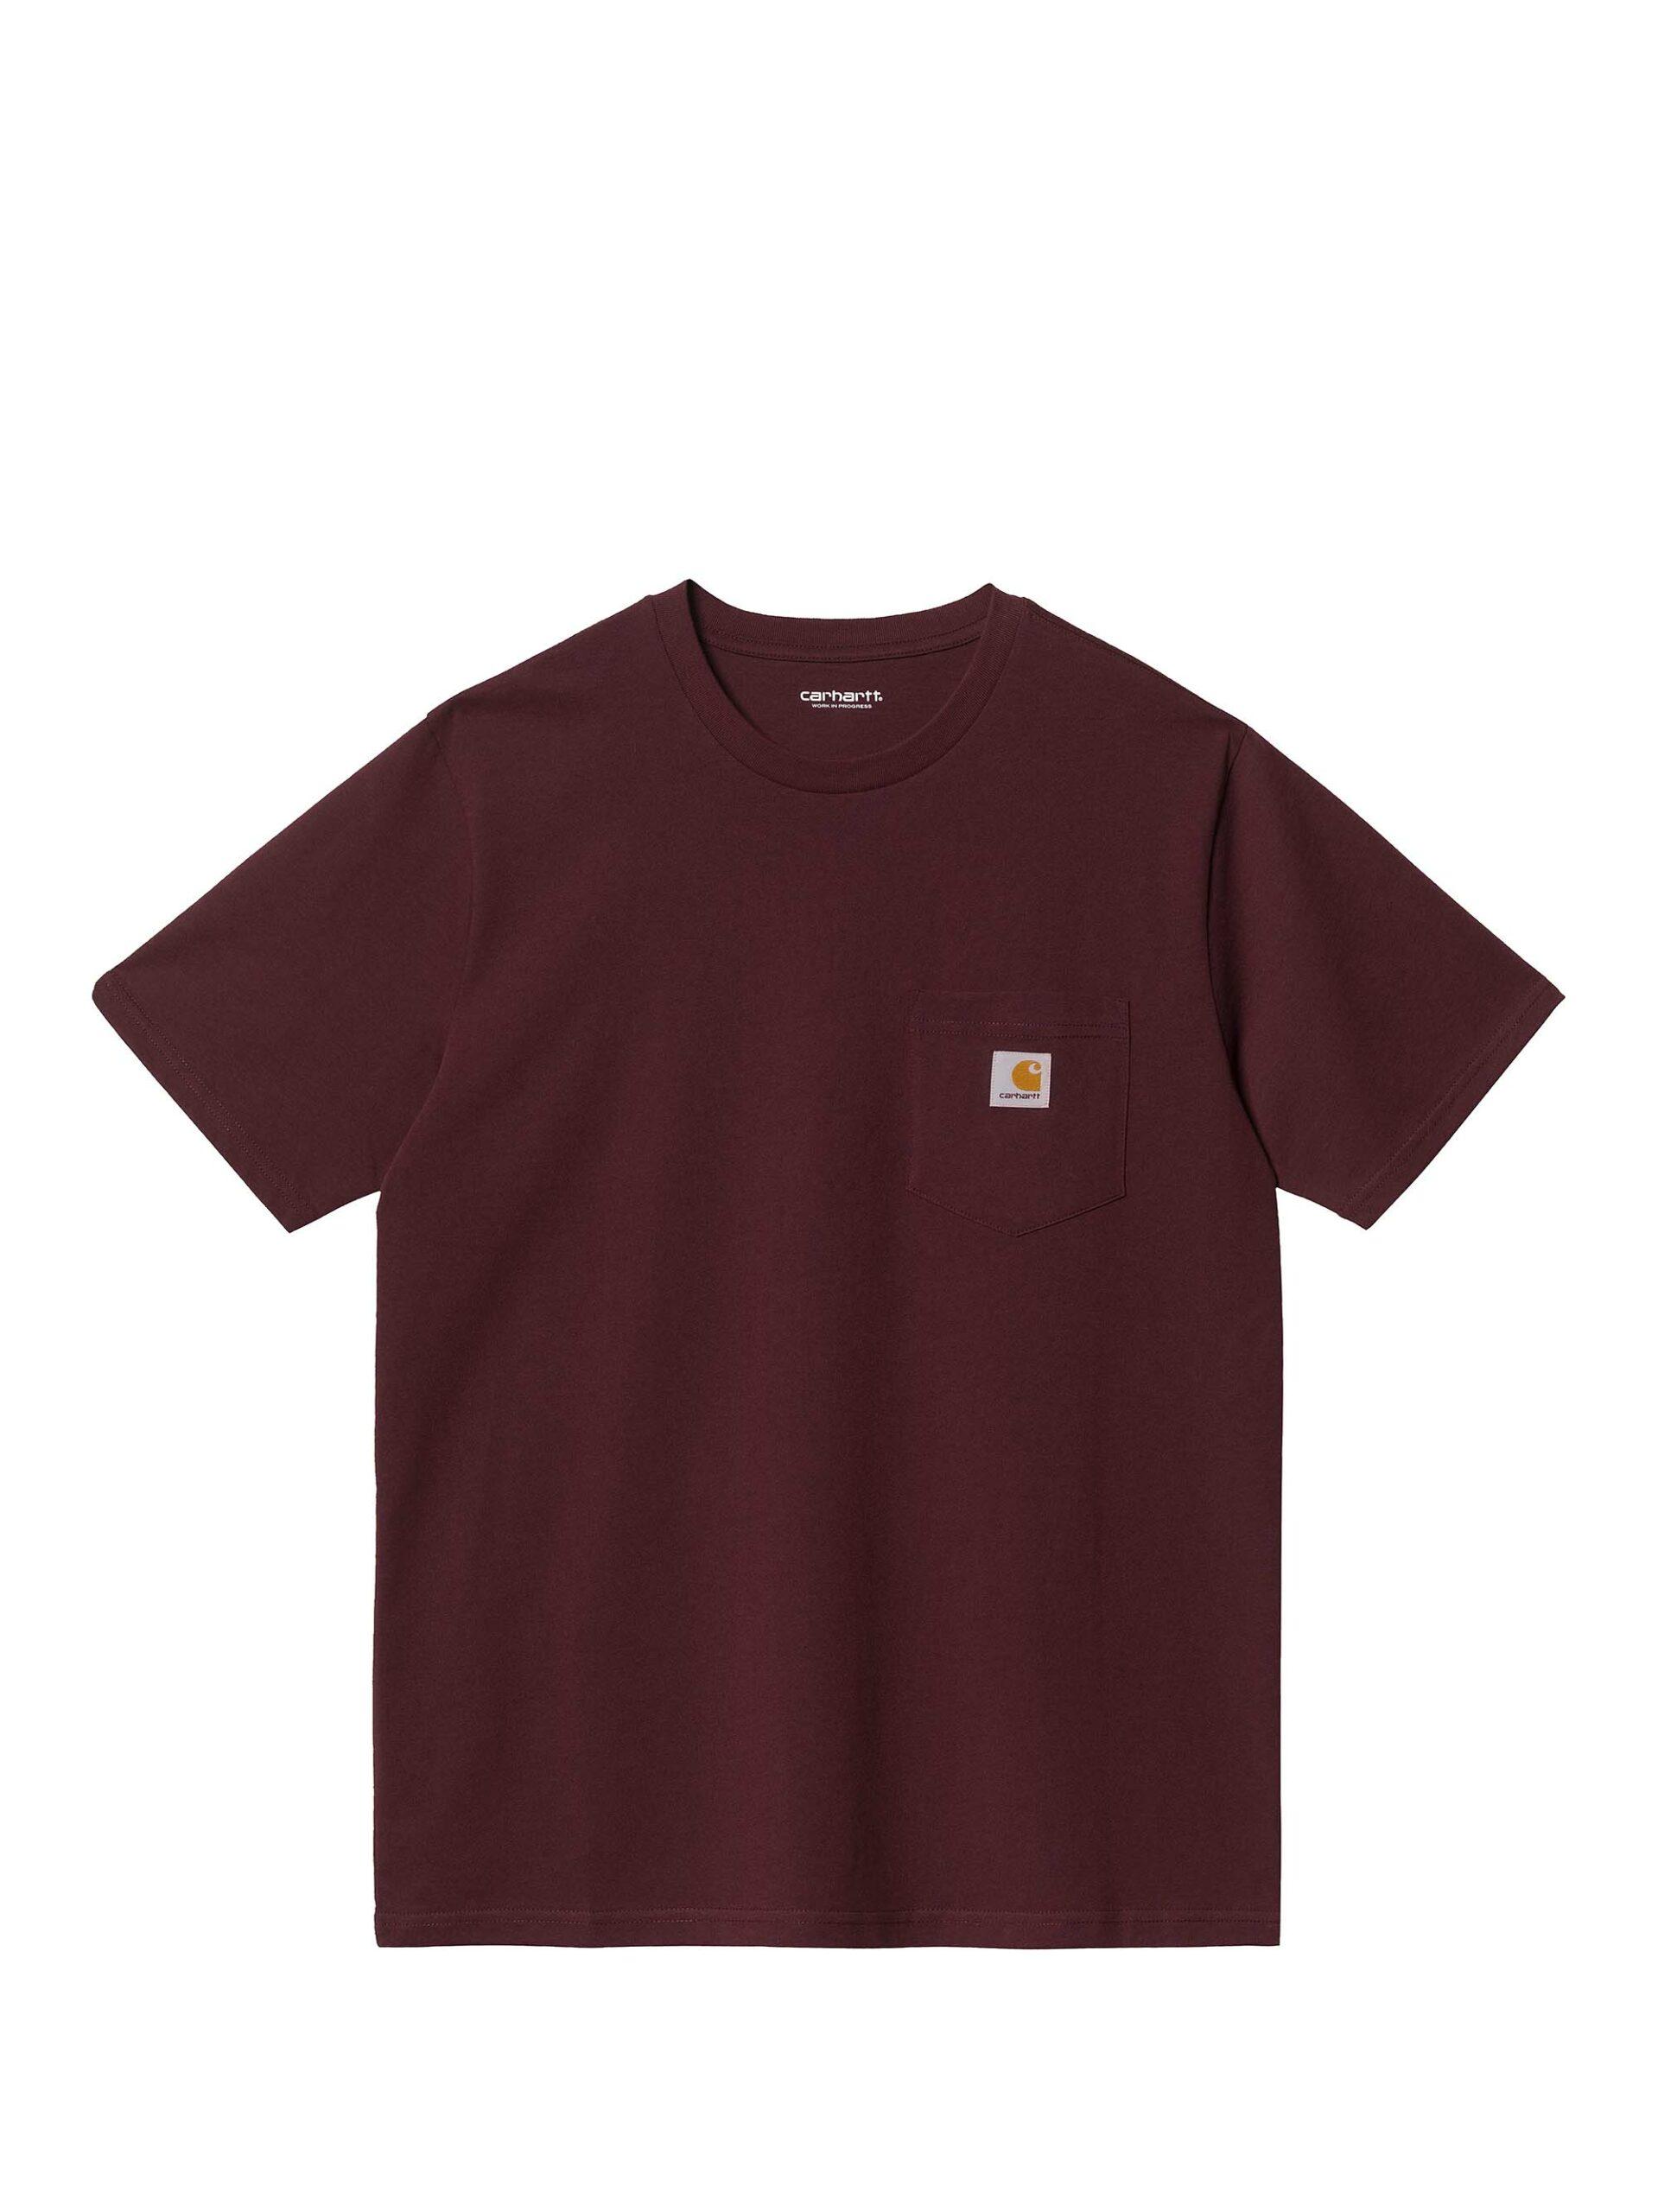 <p class='small-title'>CARHARTT WIP</p>S / S Pocket T-Shirt Brown